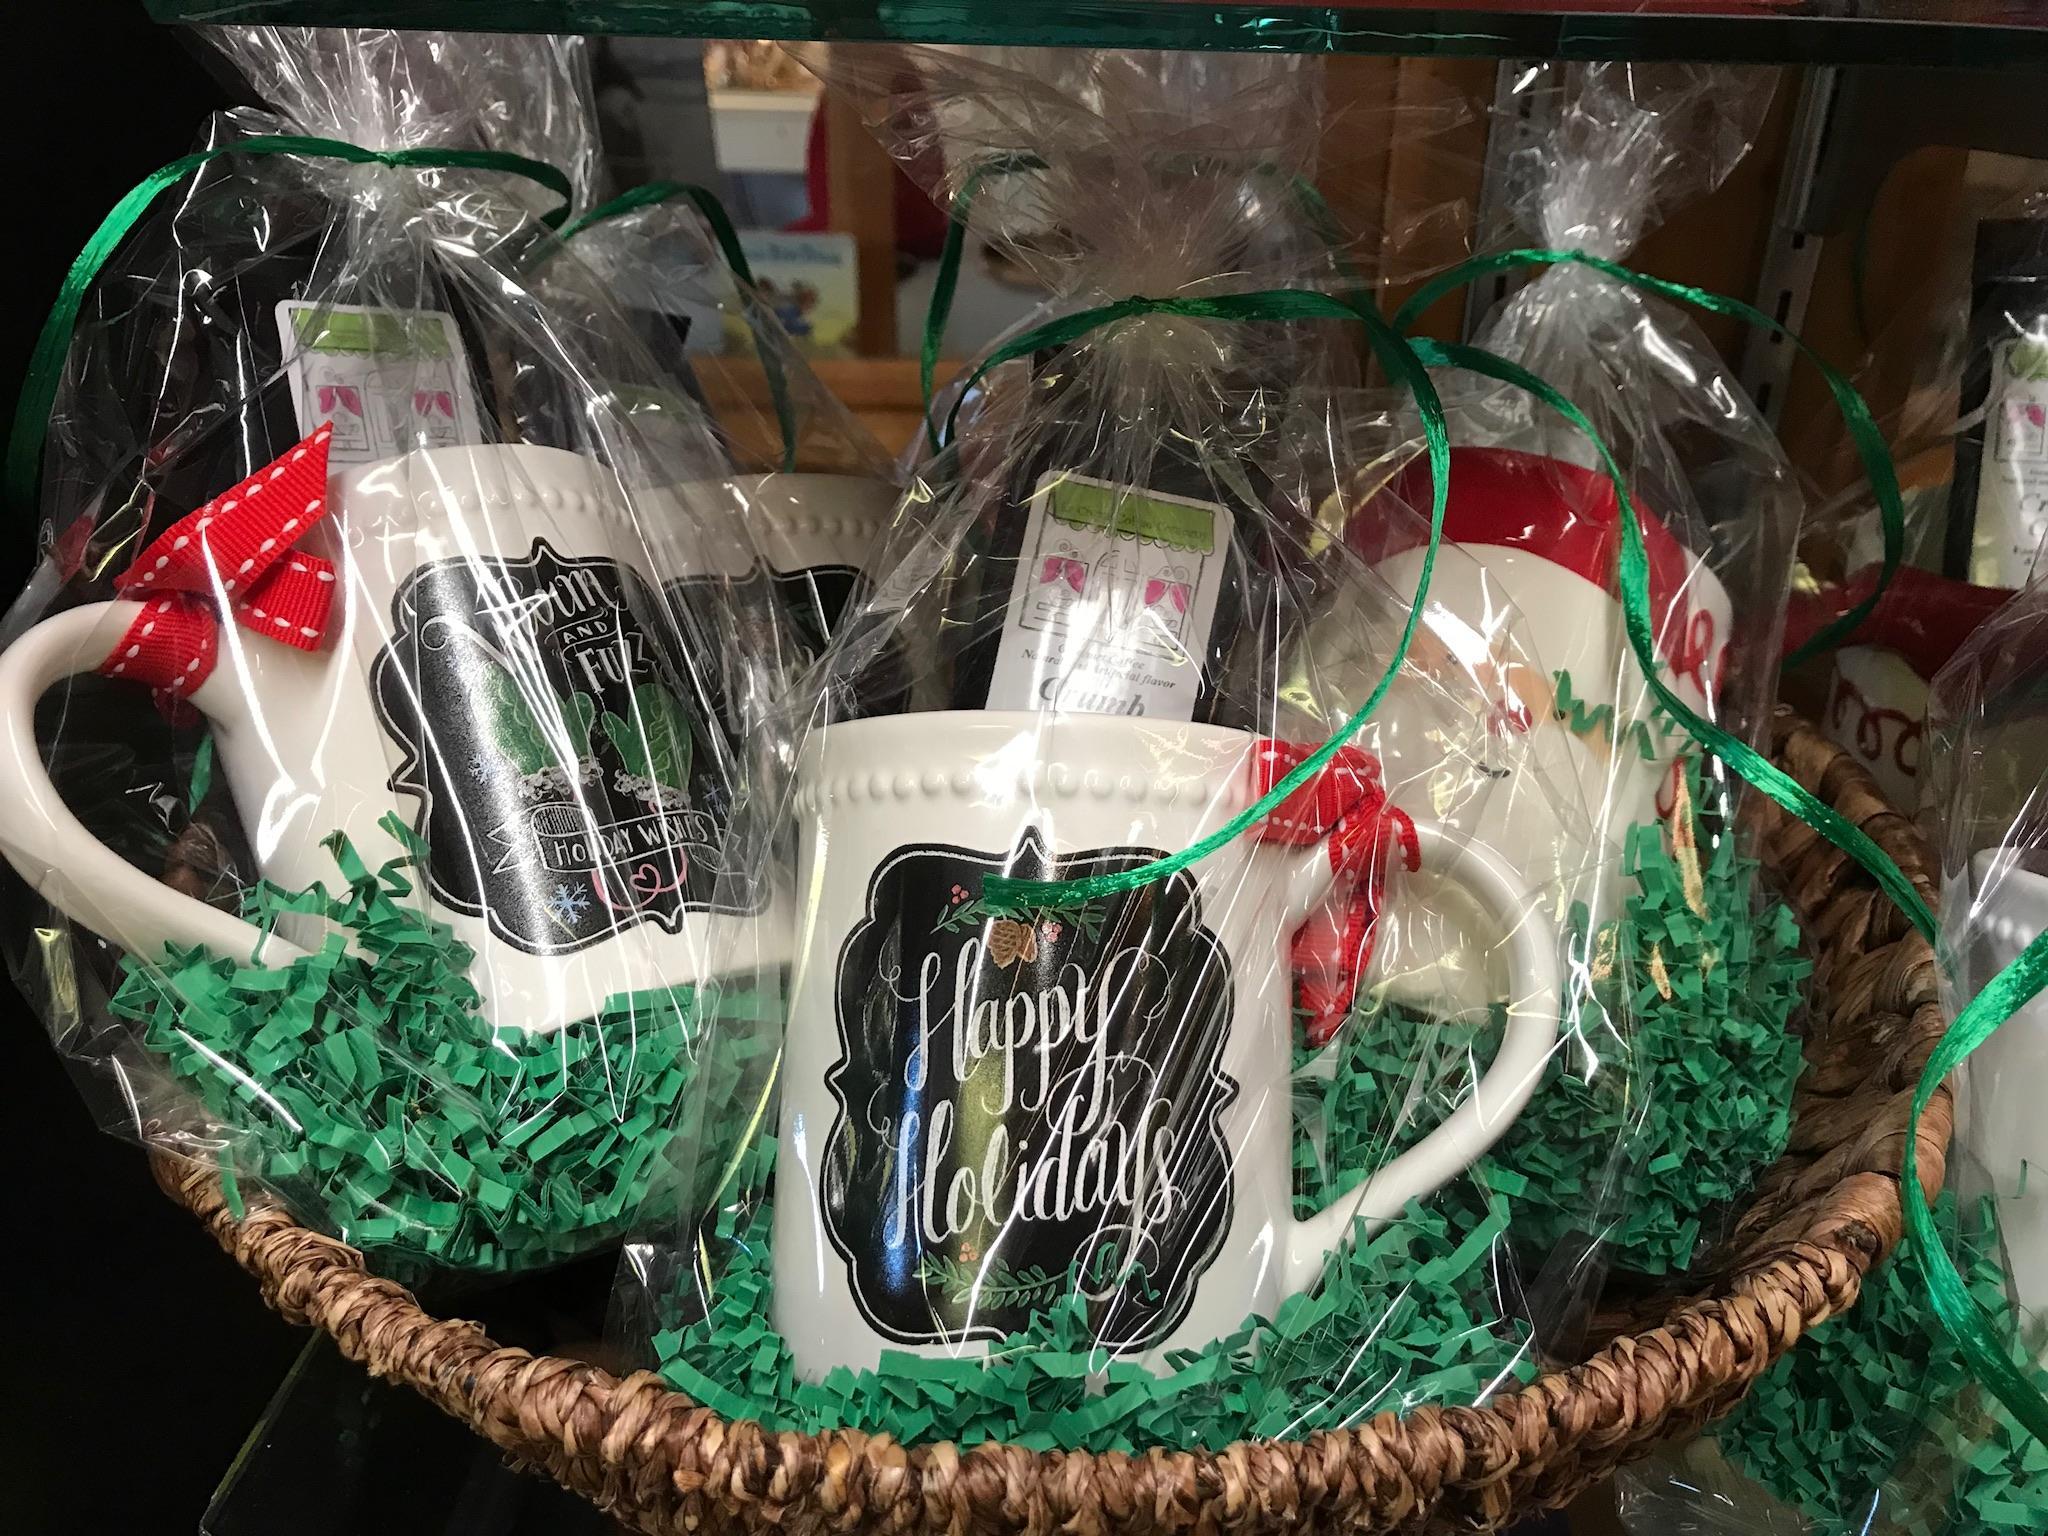 Smockingbirds Unique Gifts & Accessories, LLC image 8